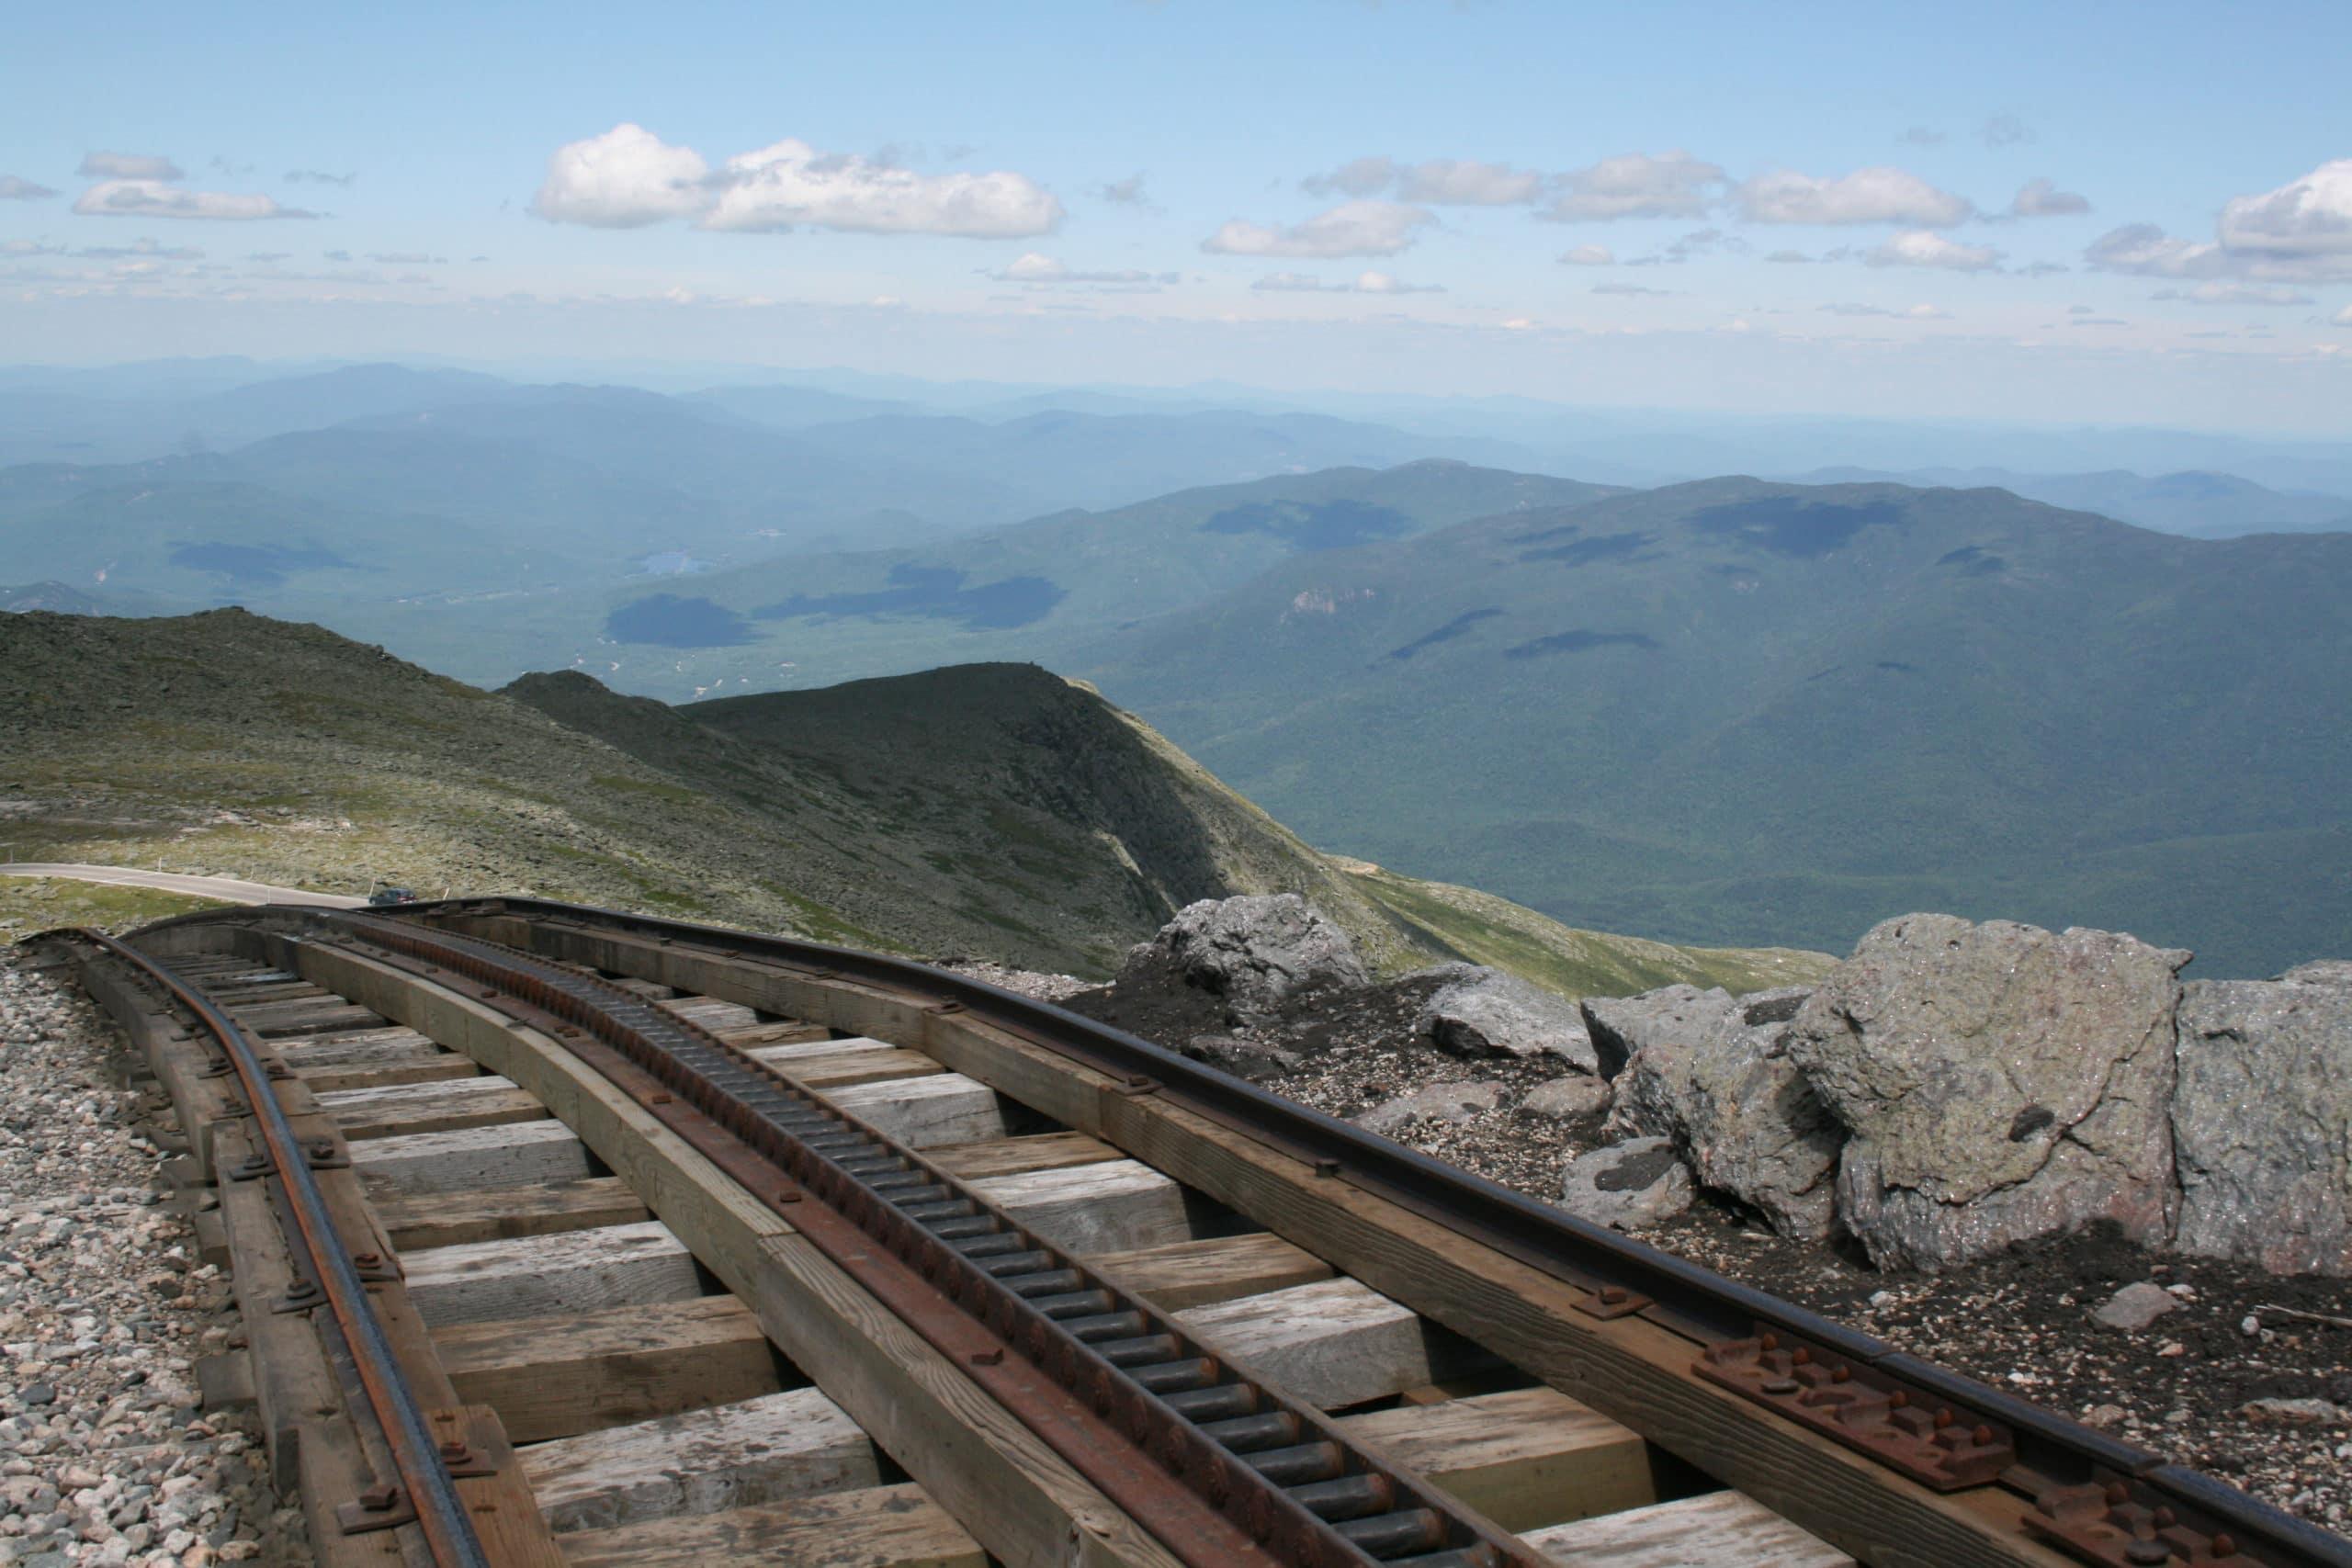 Adventures on the Cog Railway! Explore New Hampshire's Mt. Washington 2